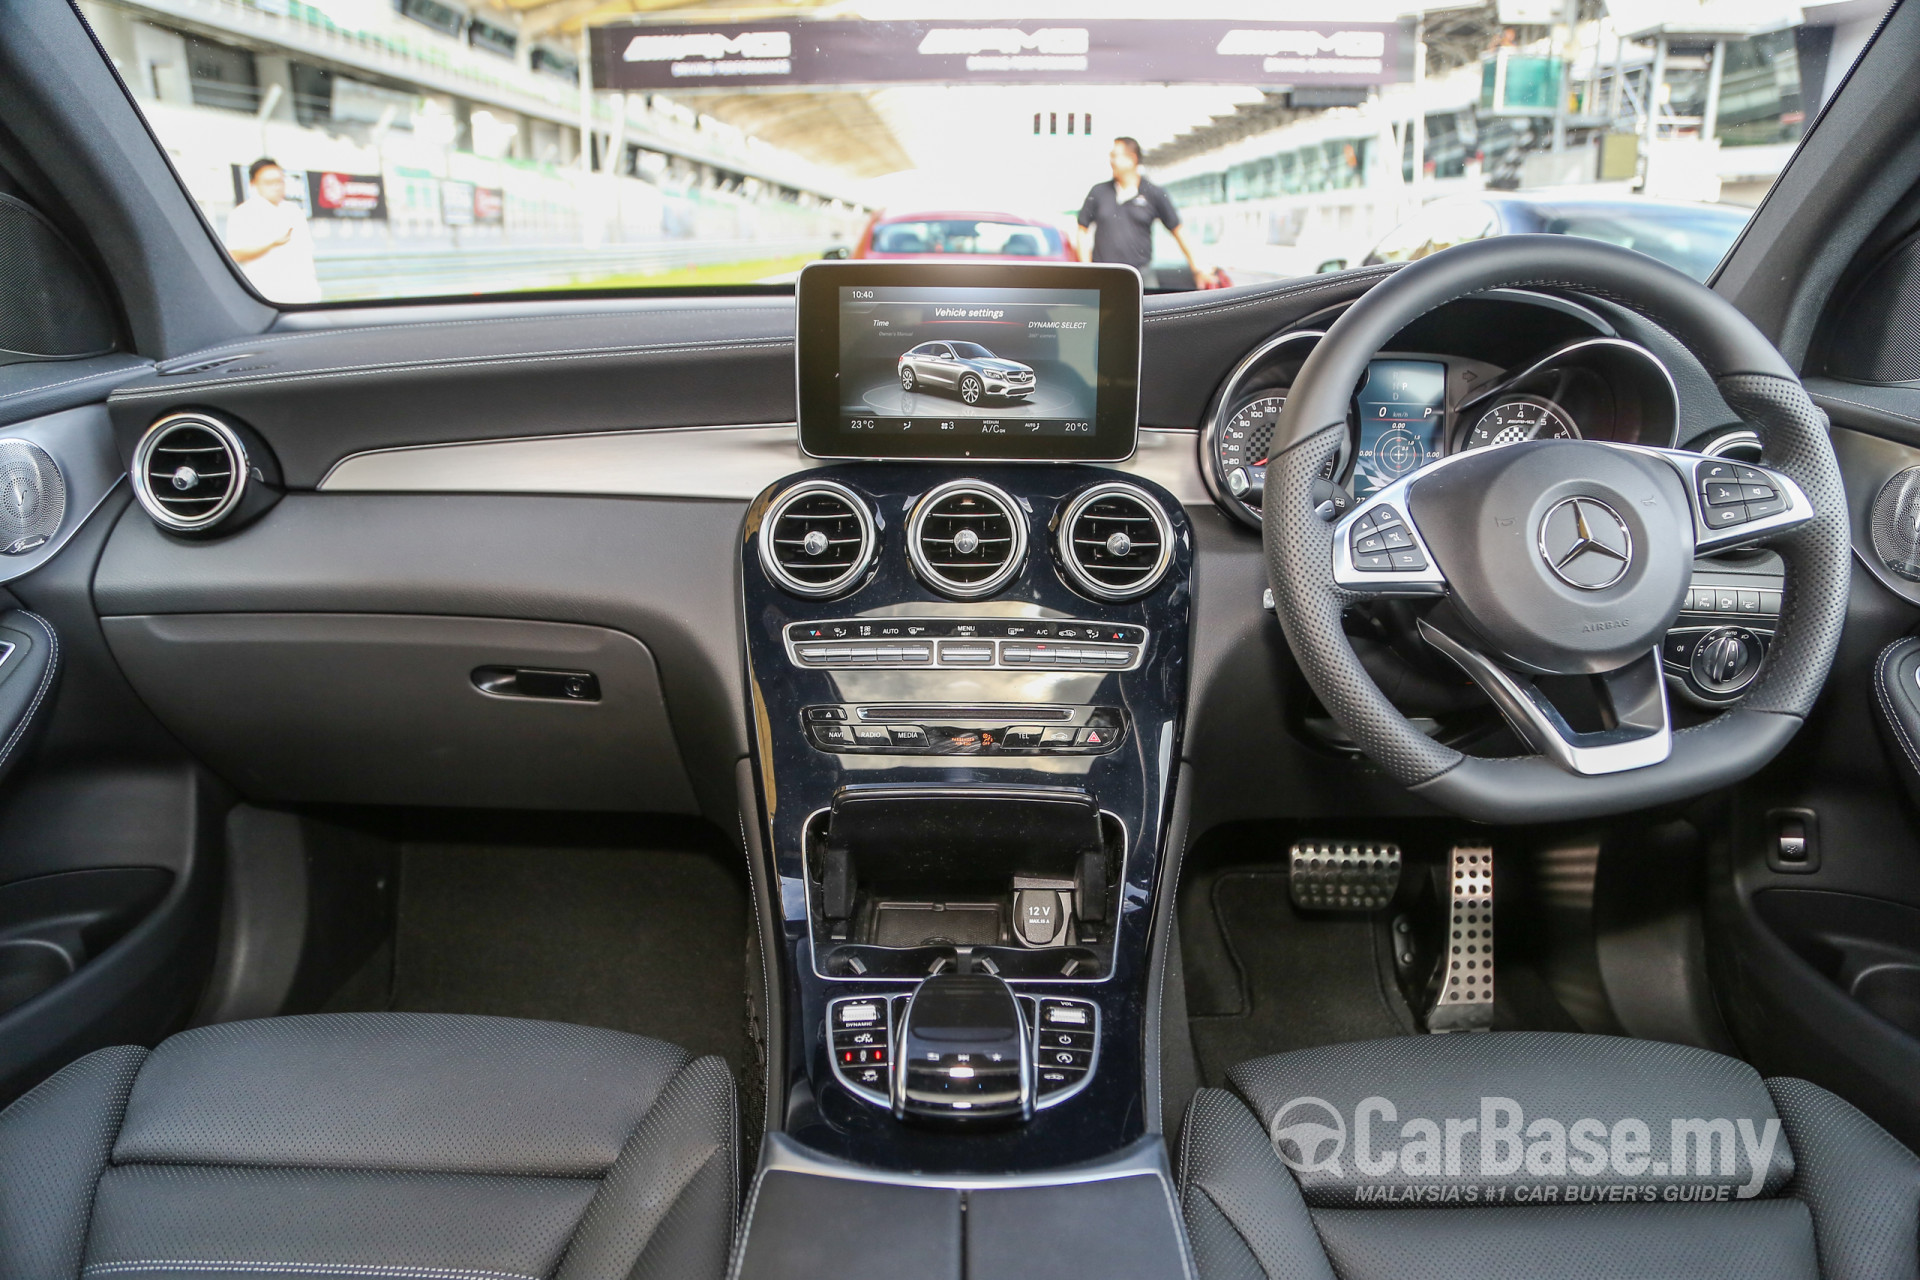 Mercedes Benz GLC Coupe AMG C253 2017 Interior Image In